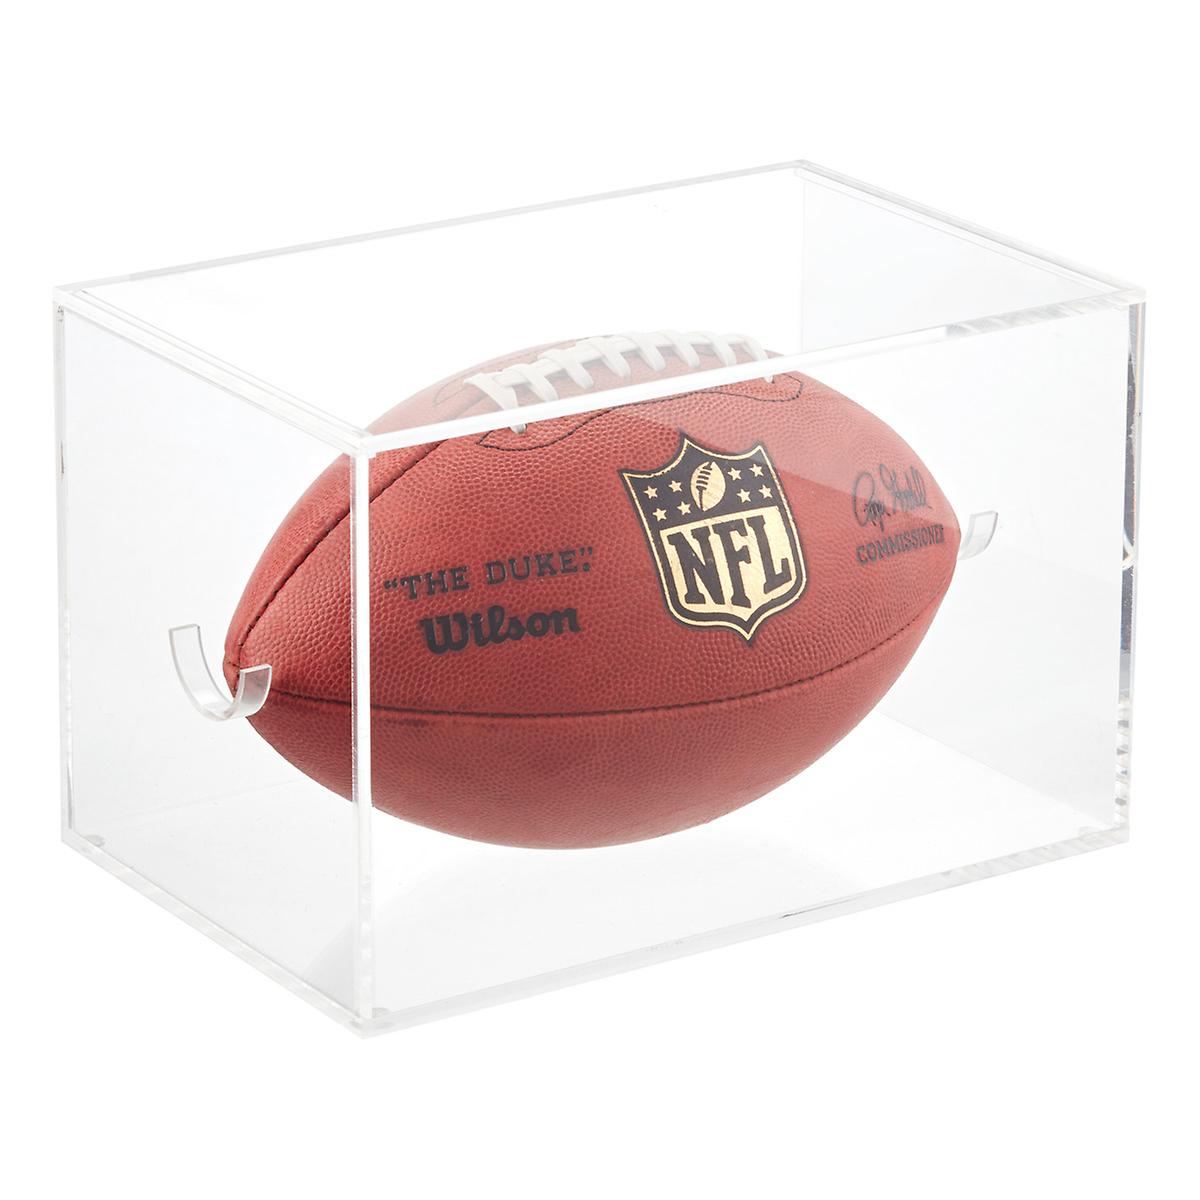 Acrylic Football Display Cube